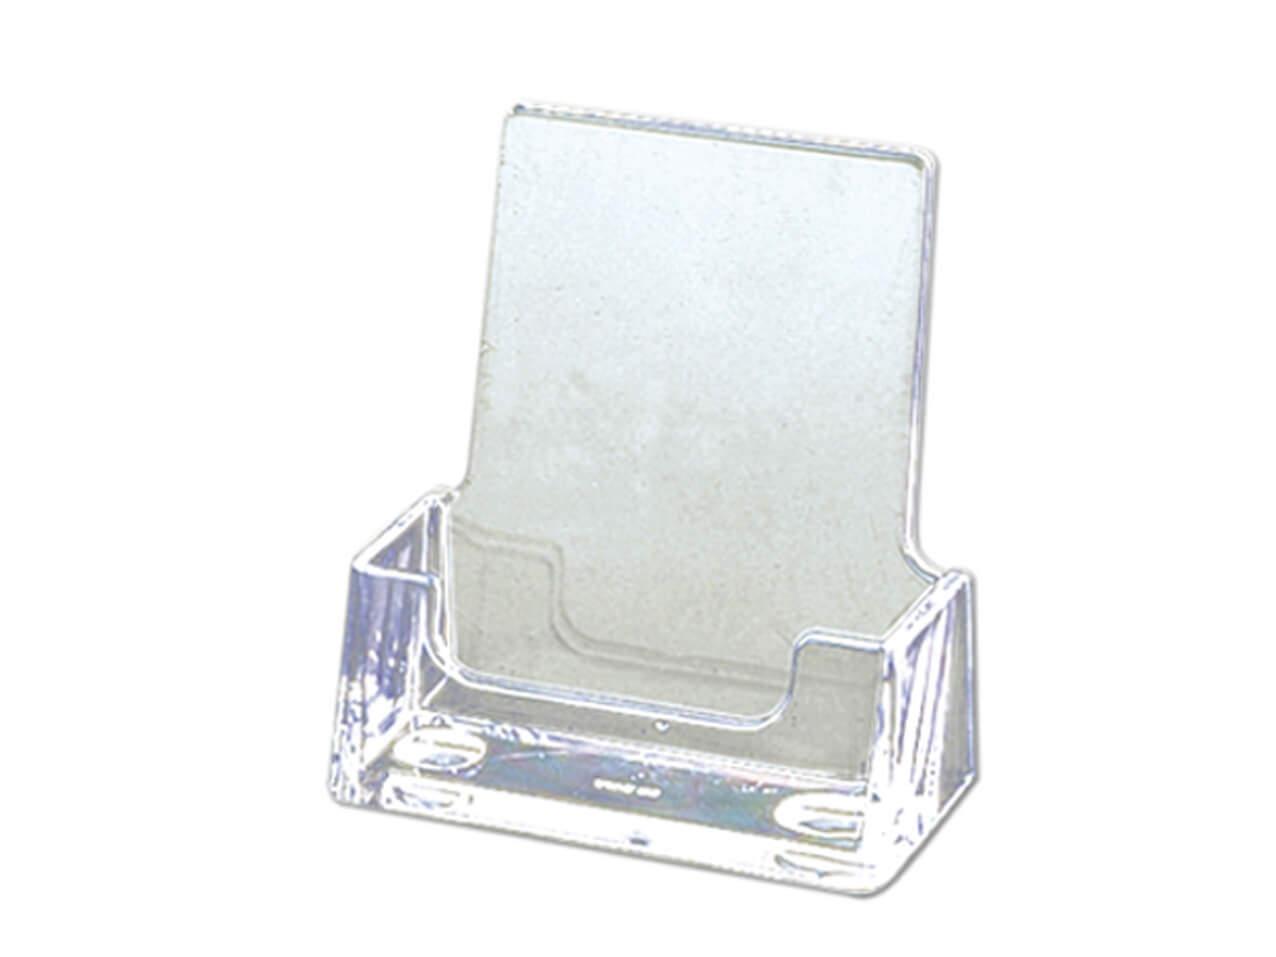 1211-Visitenkartenhalter-Acrylbox-vertikal